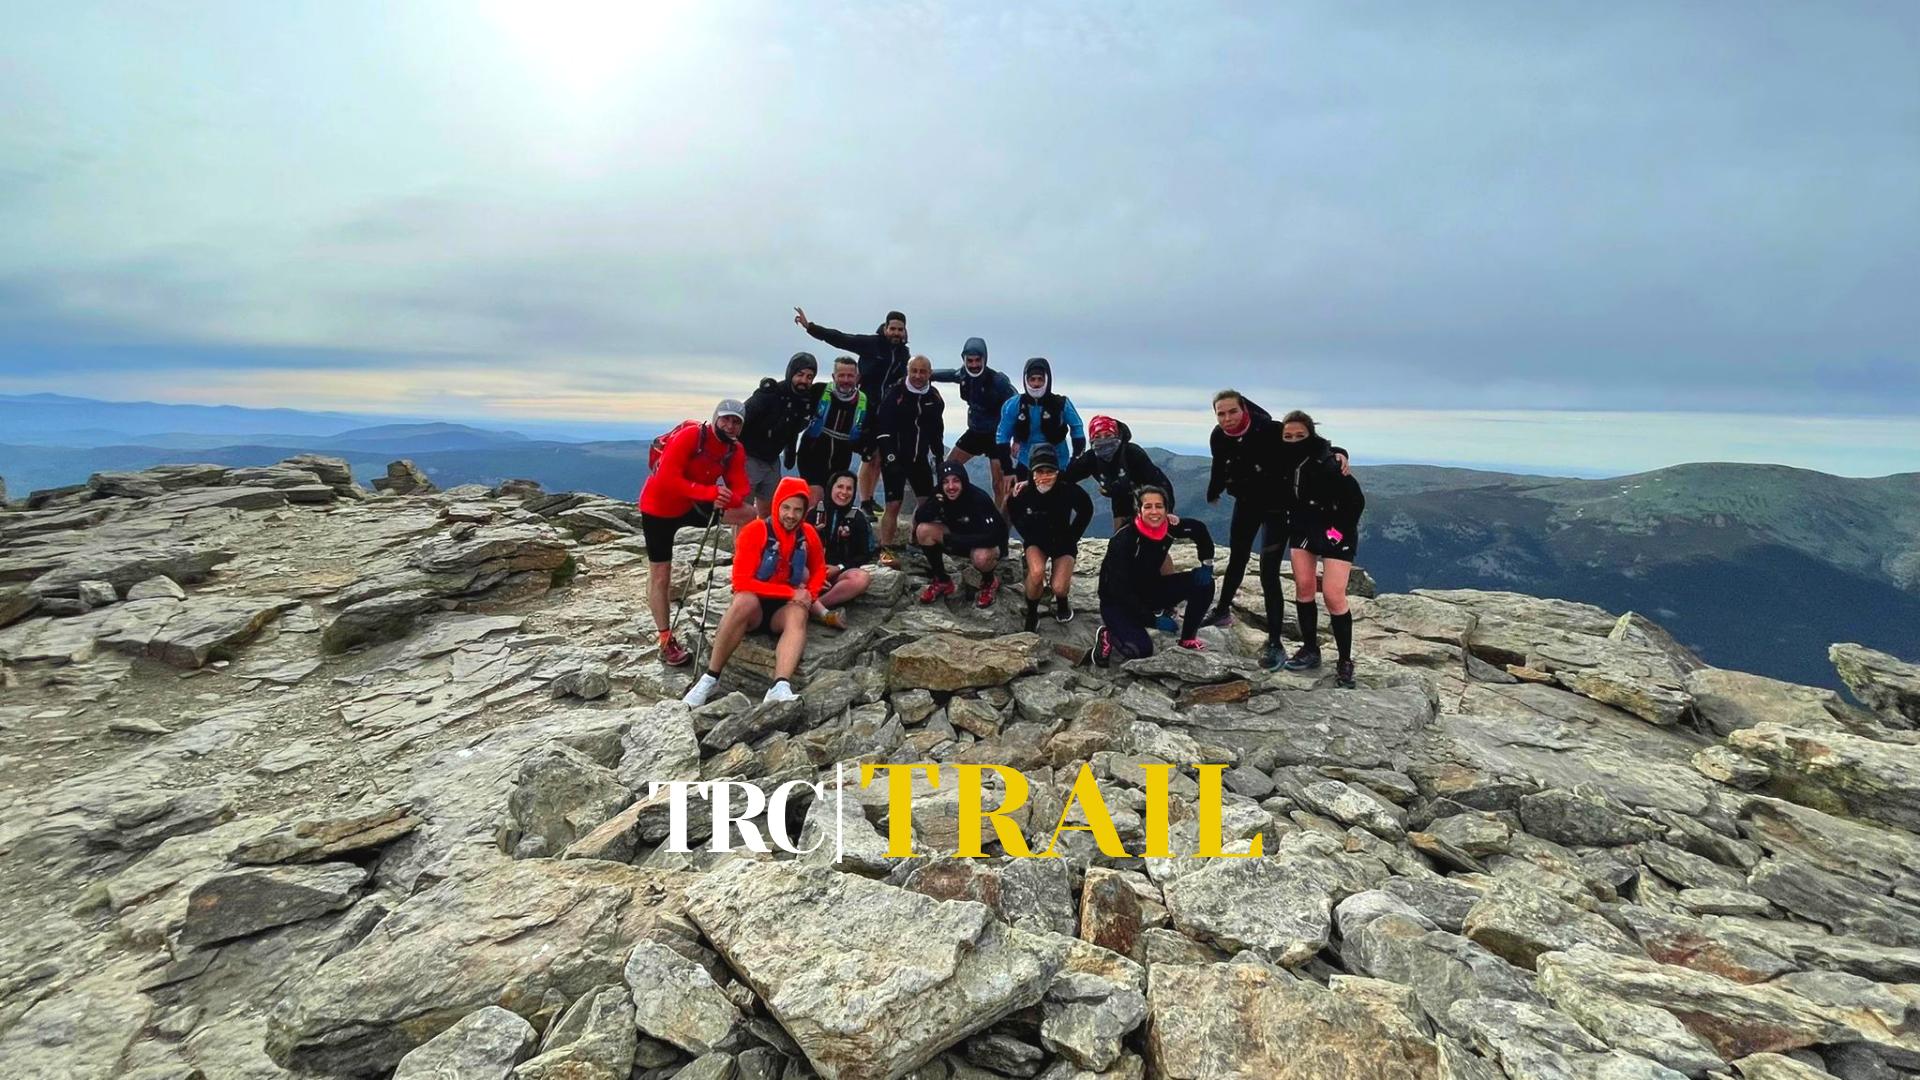 Club de Trail Running Madrid